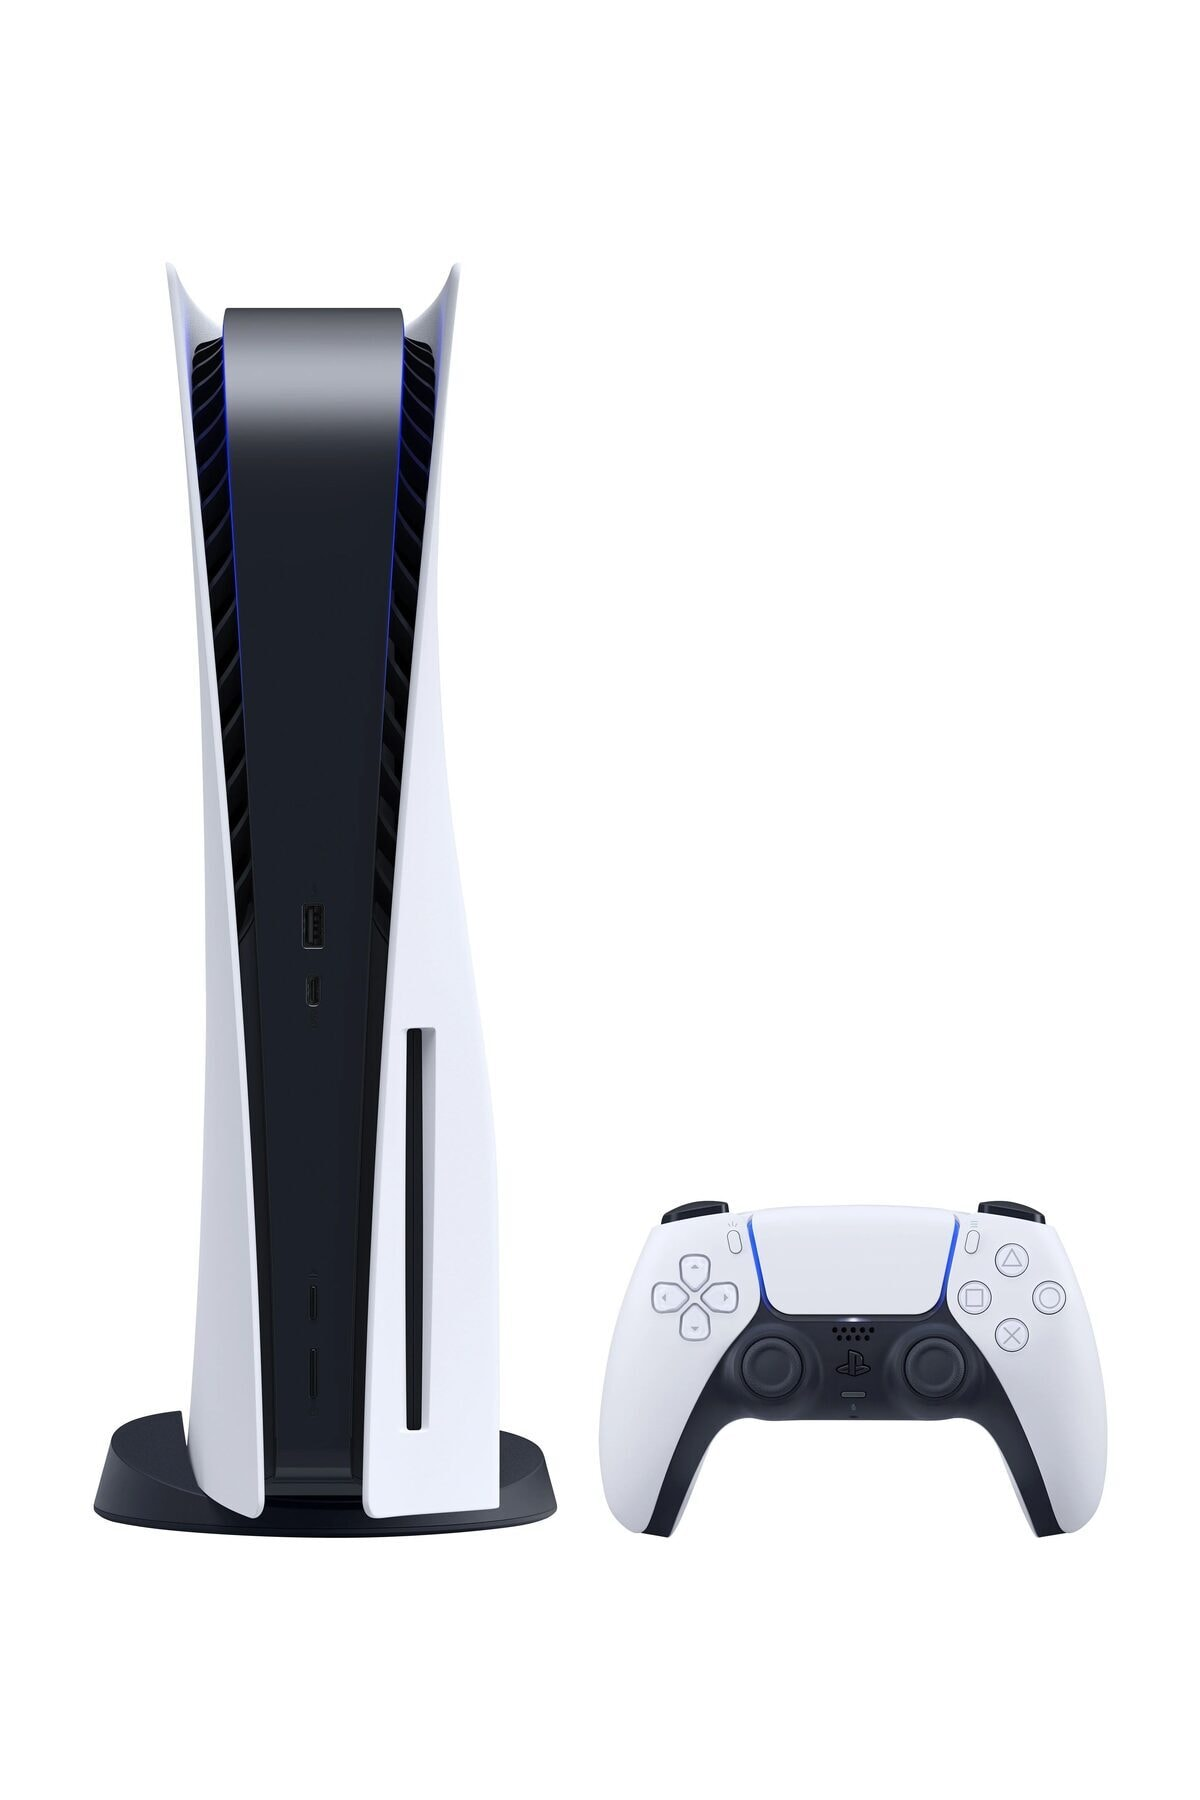 Sony Playstation 5 825 GB - Türkçe Menü - PS5 (Eurasia Garantili) 1